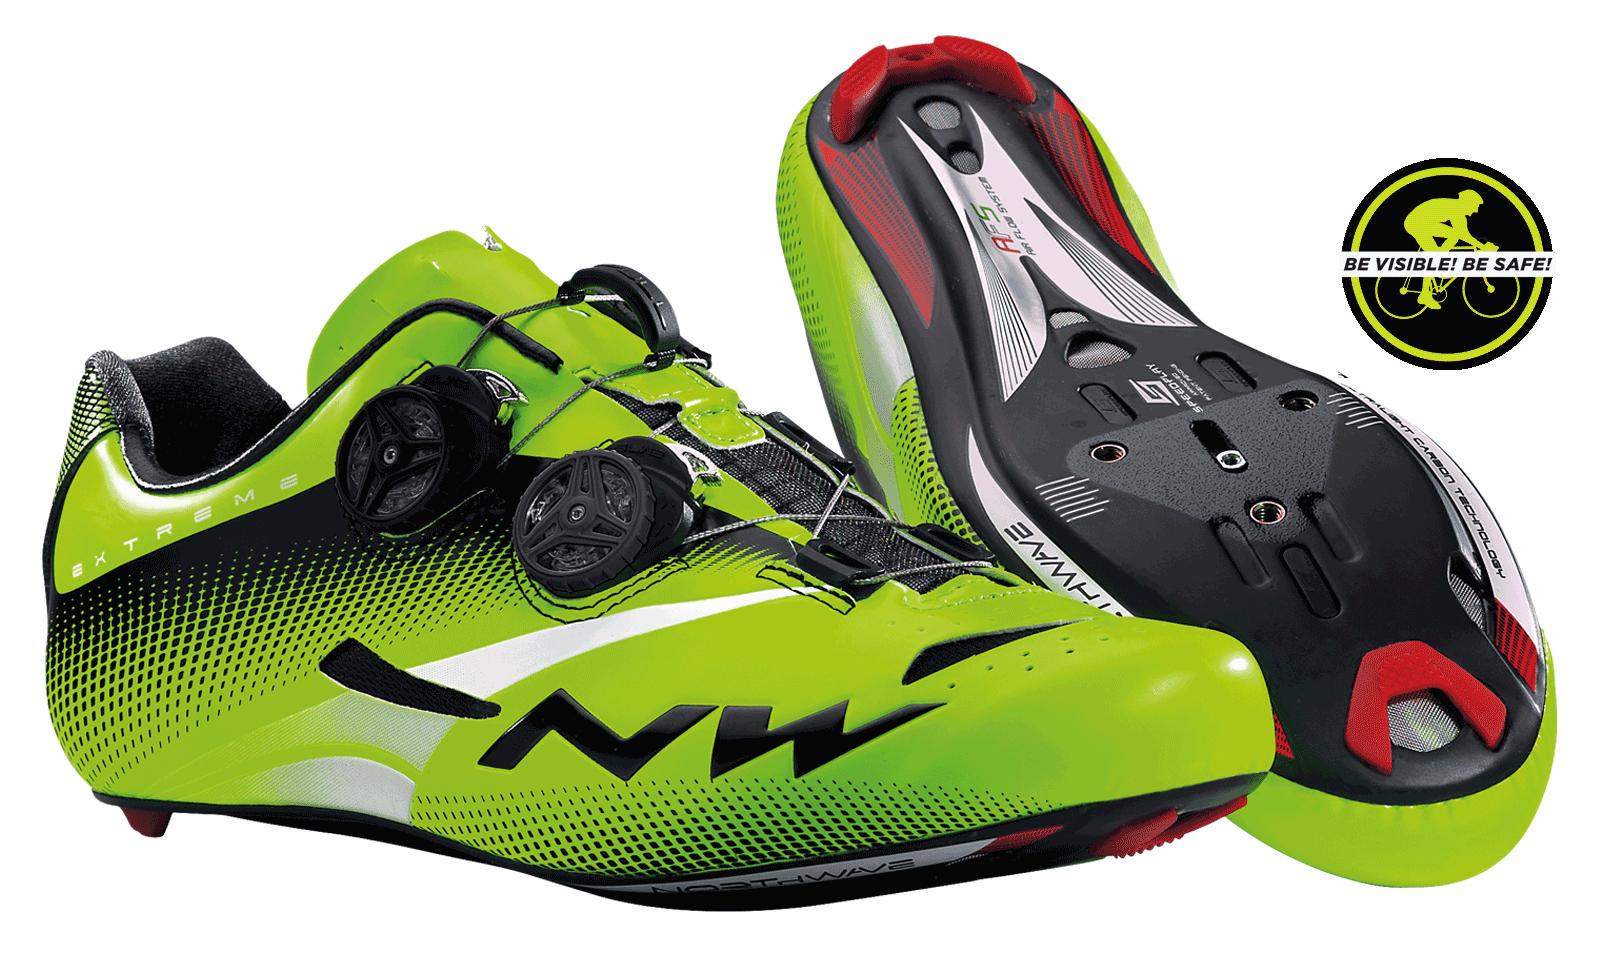 NorthWave Extreme Tech Plus Herre Racersko - Green Fluo